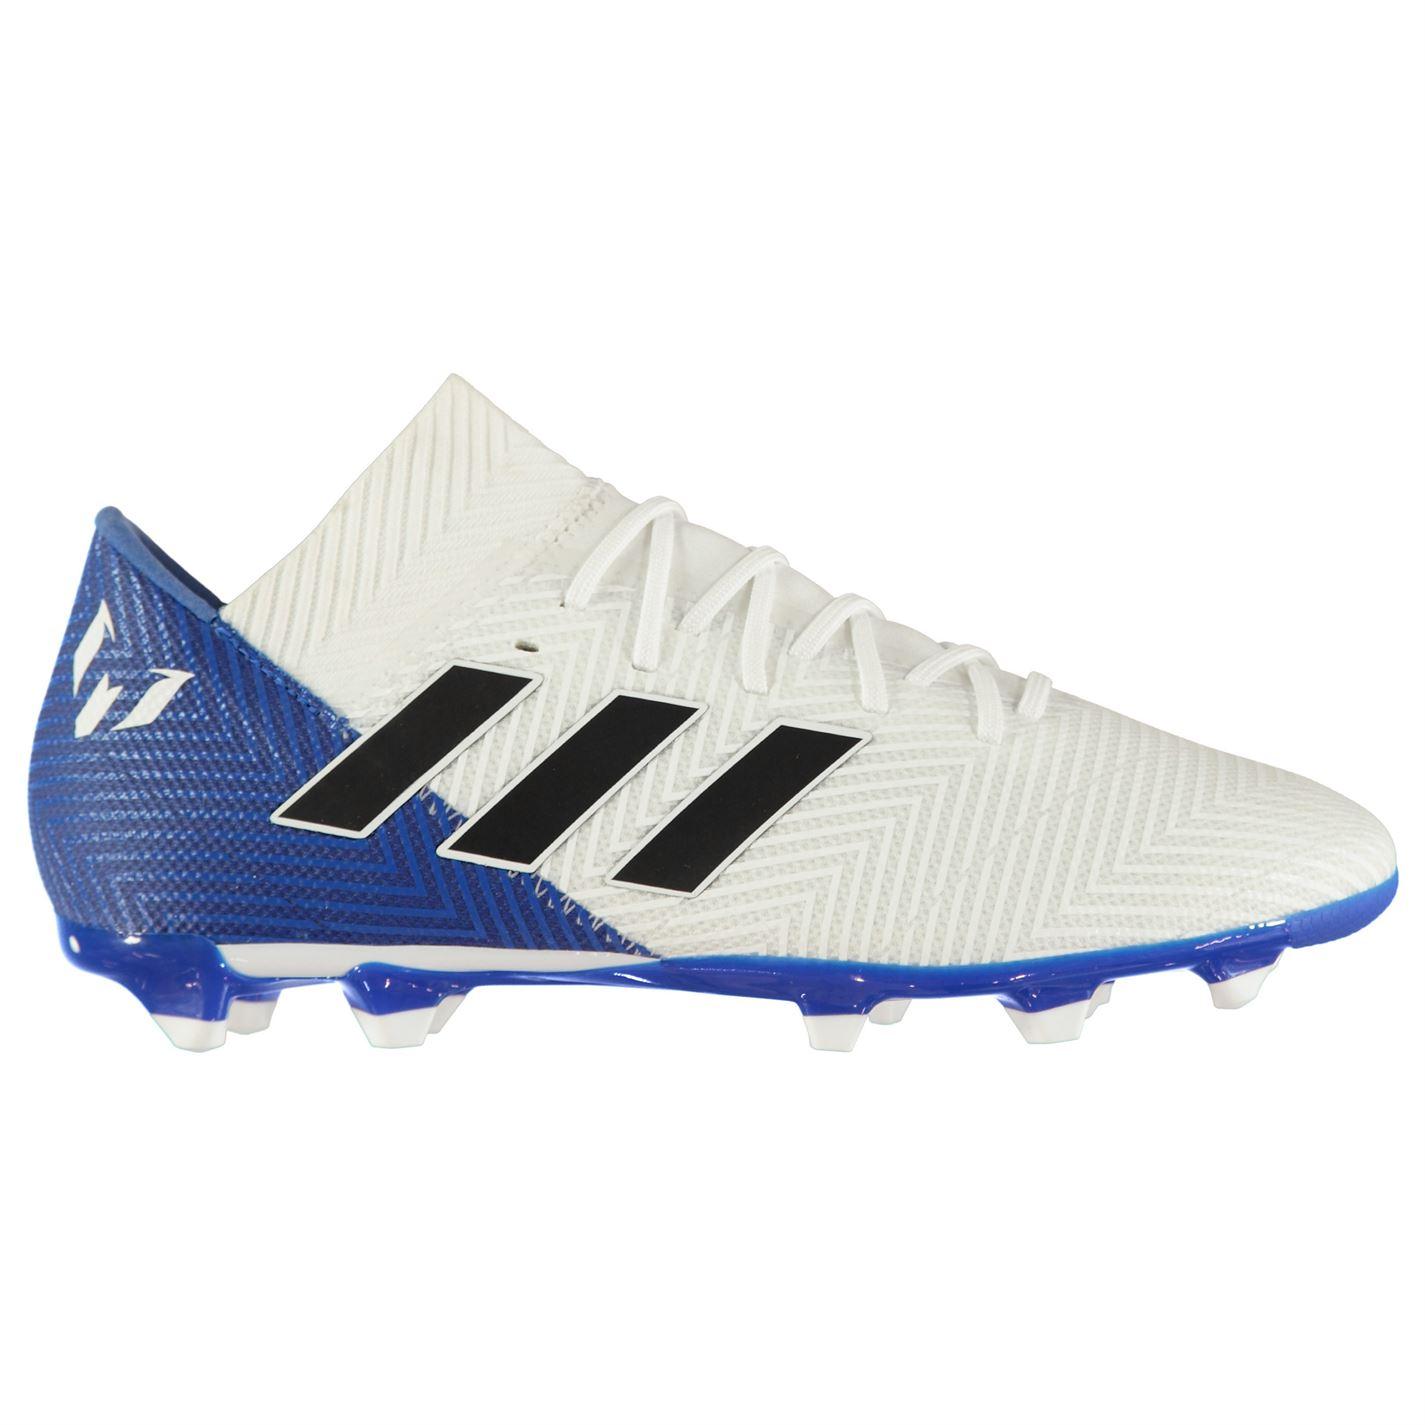 75ff233004132 kopačky adidas Nemeziz Messi 18.3 pánské FG